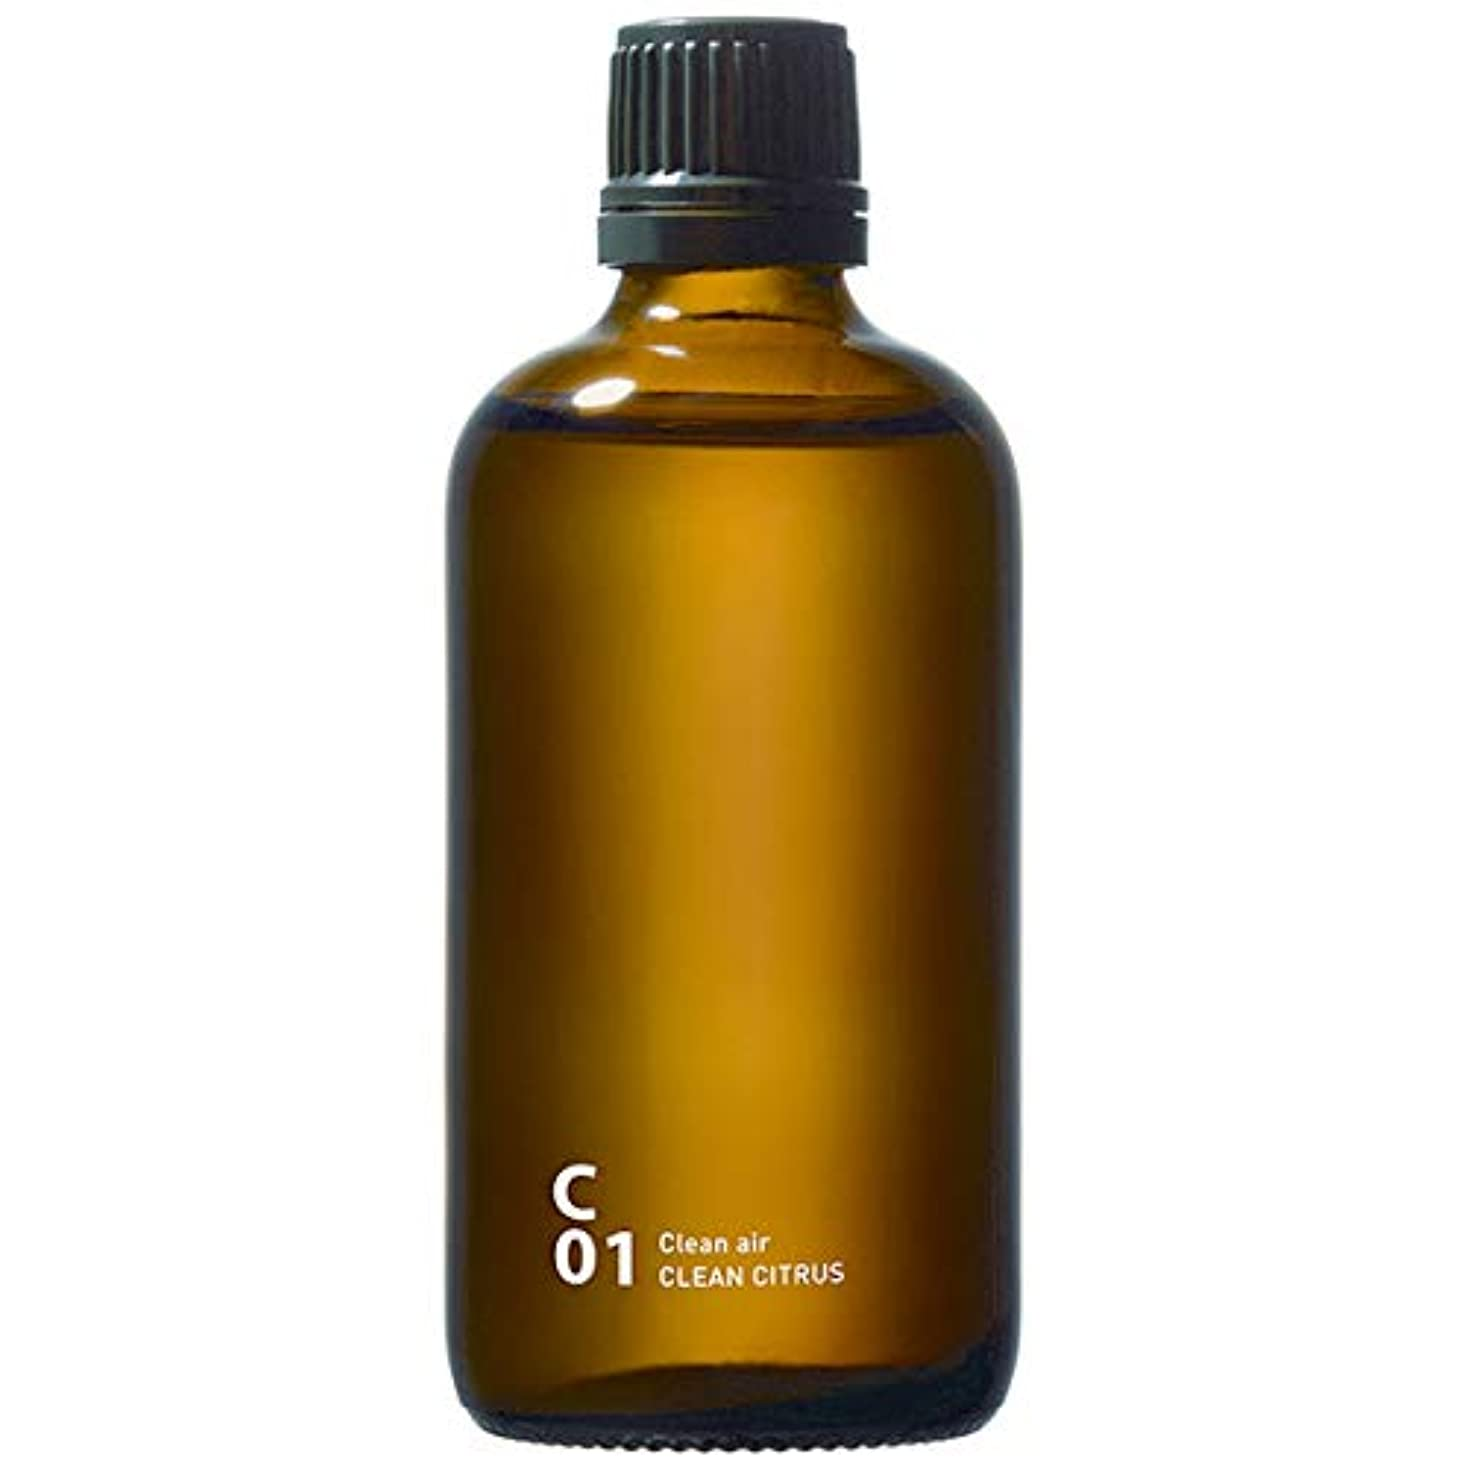 中庭下着玉ねぎC01 CLEAN CITRUS piezo aroma oil 100ml